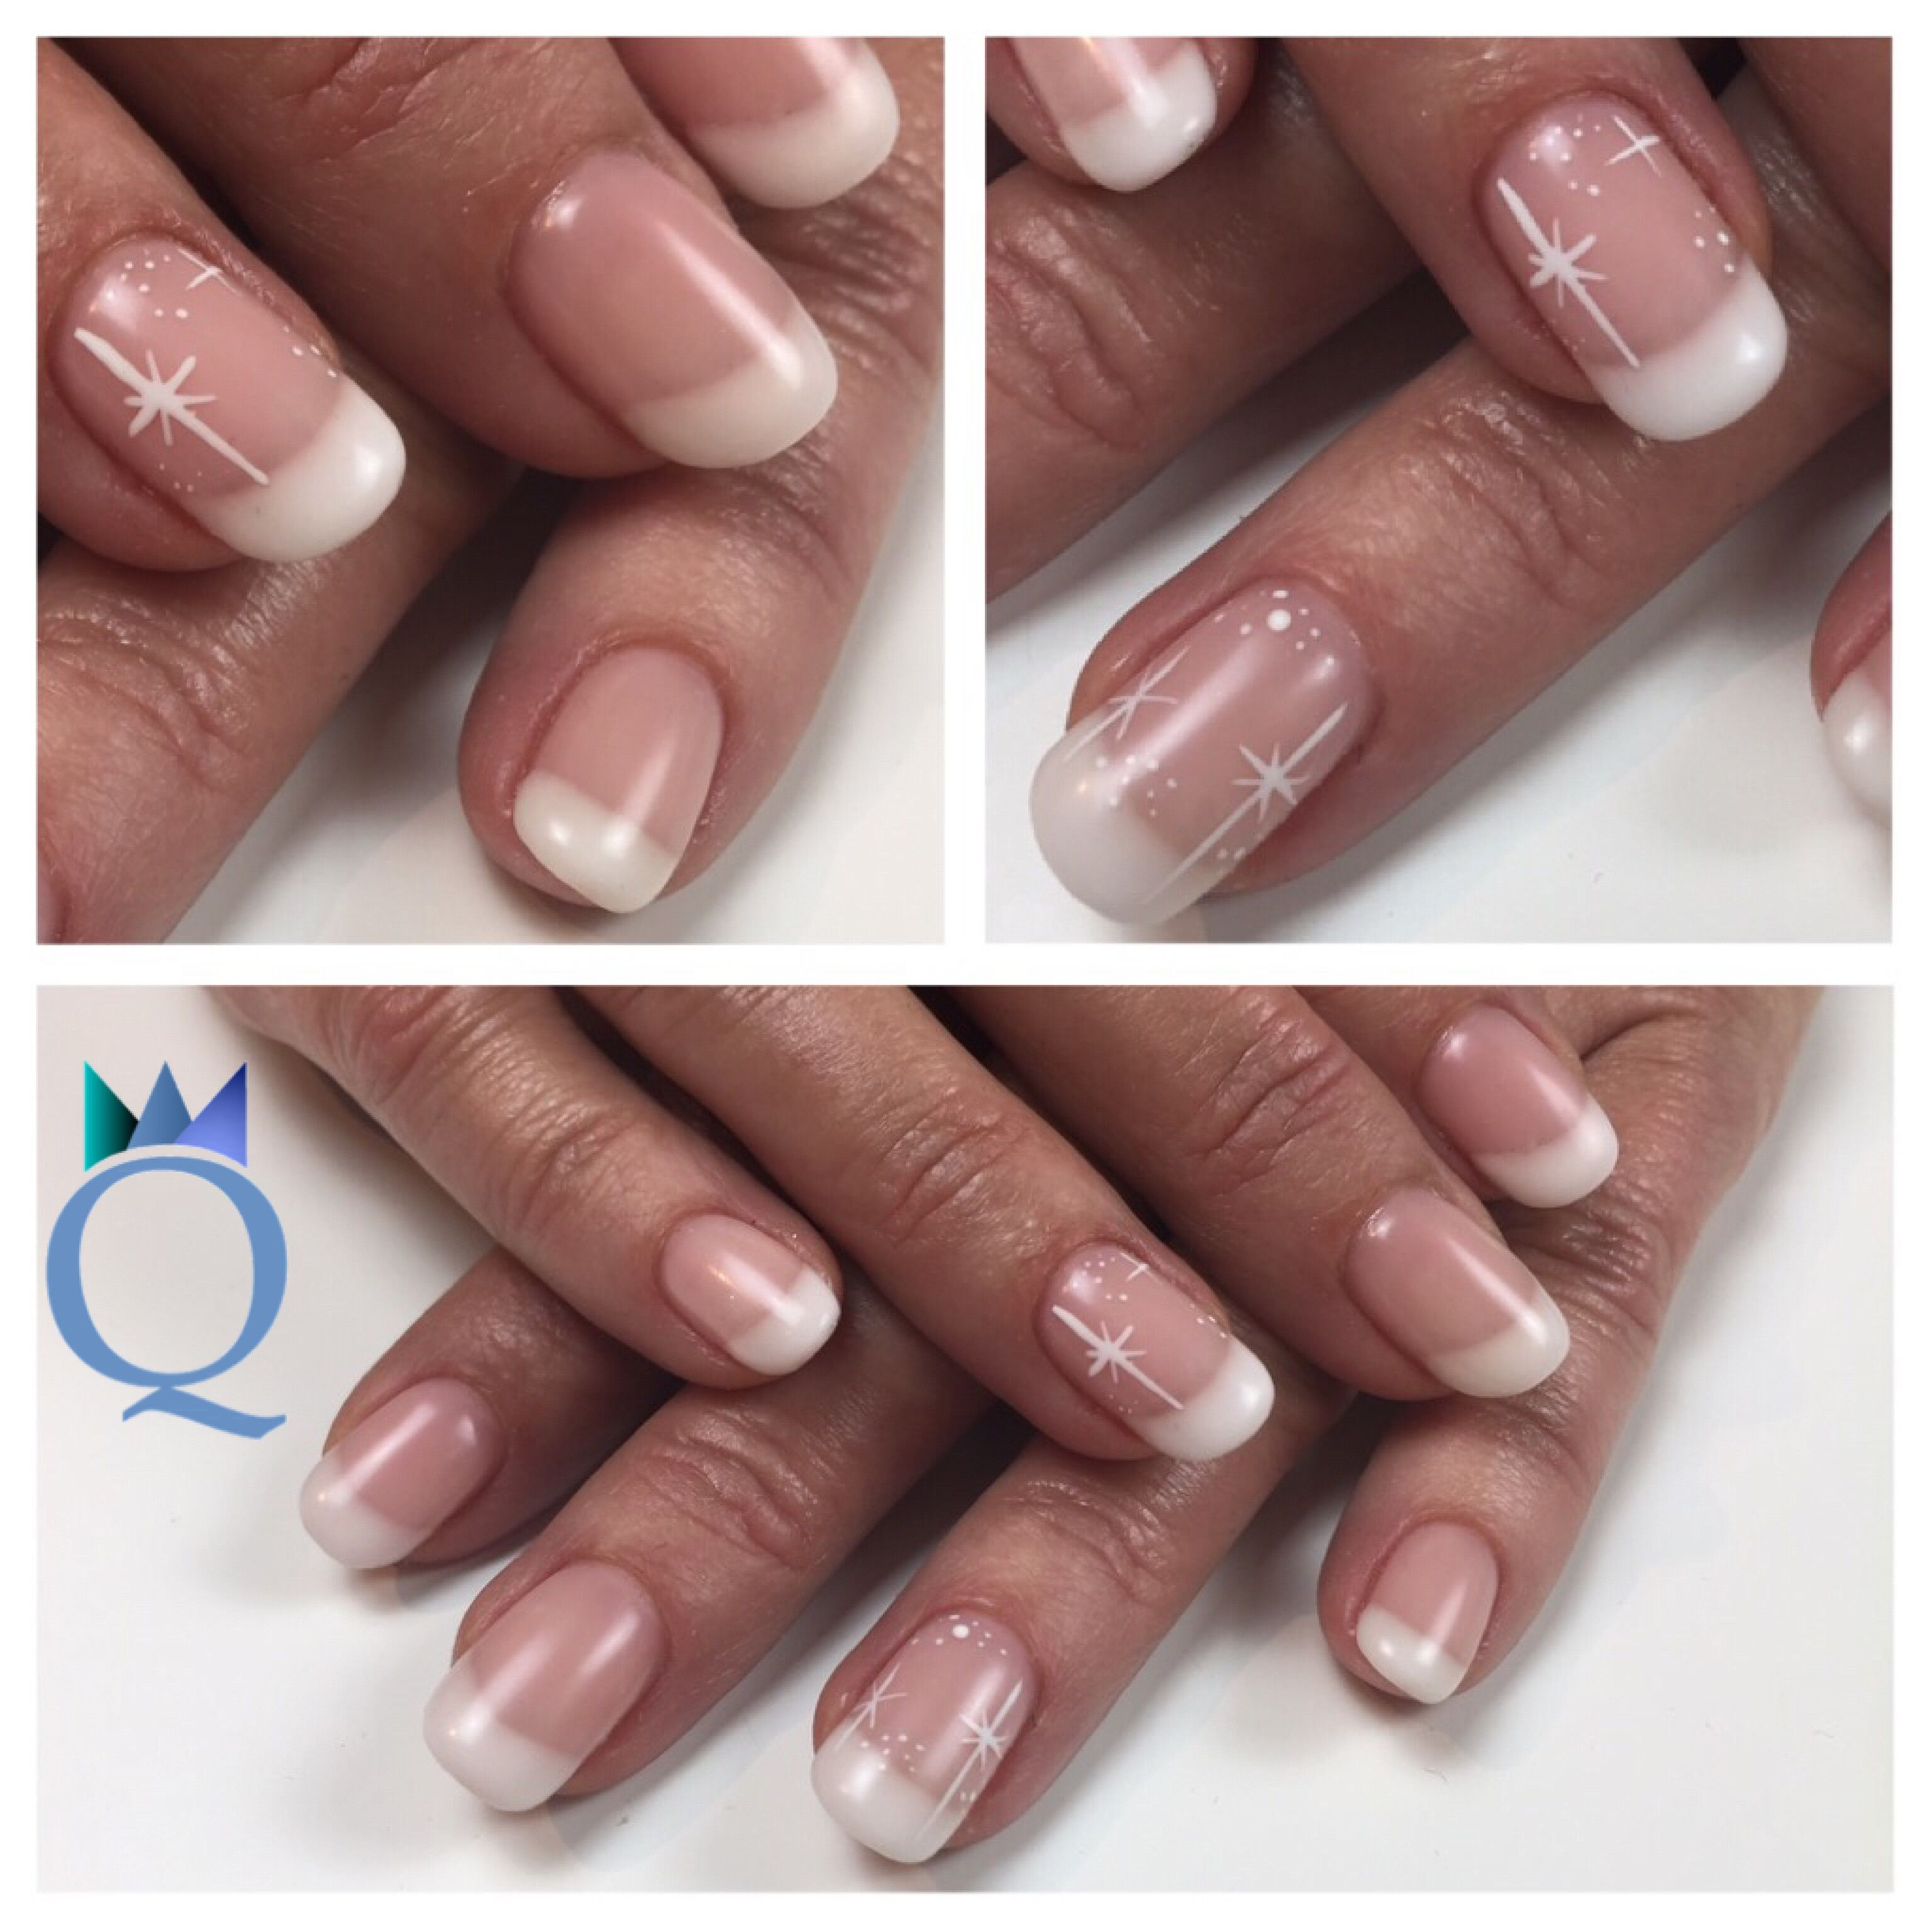 shortnails #gelnails #nails #frenchnails #mat #handpainted #white ...